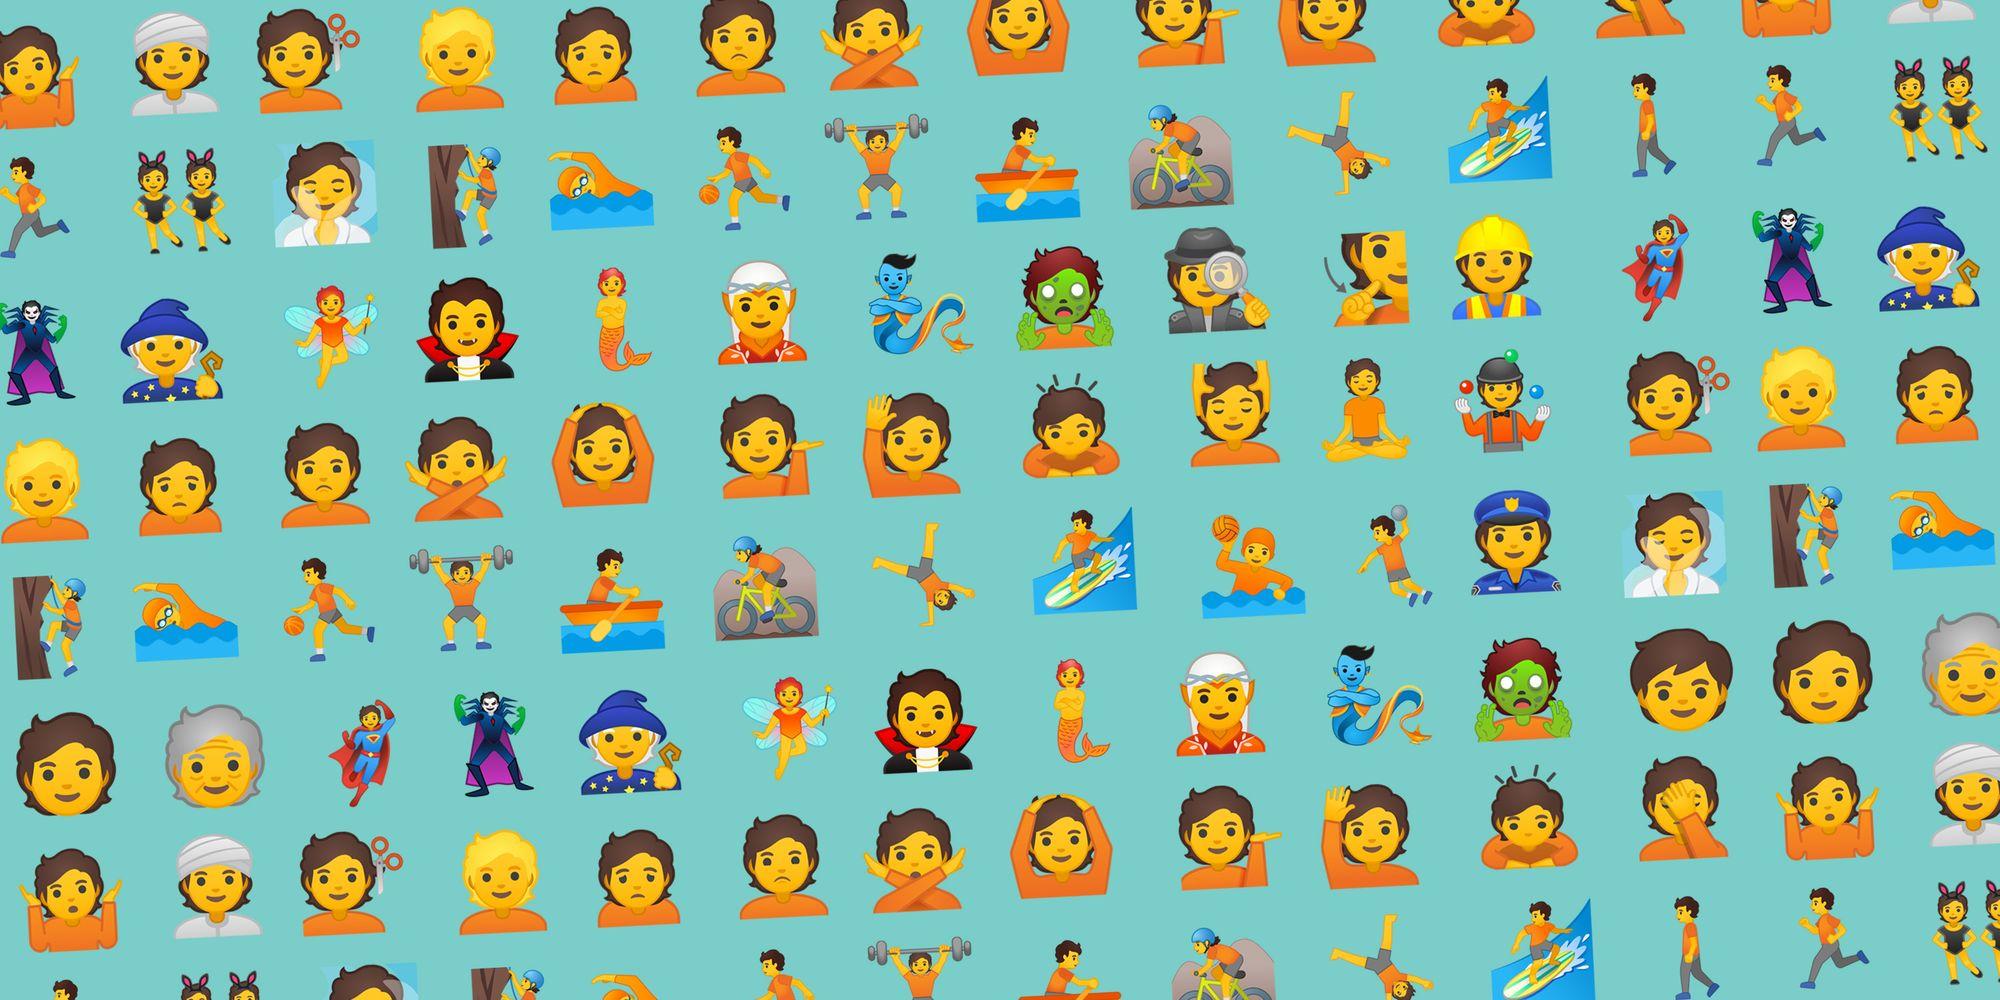 Android 10 0 Emoji Changelog